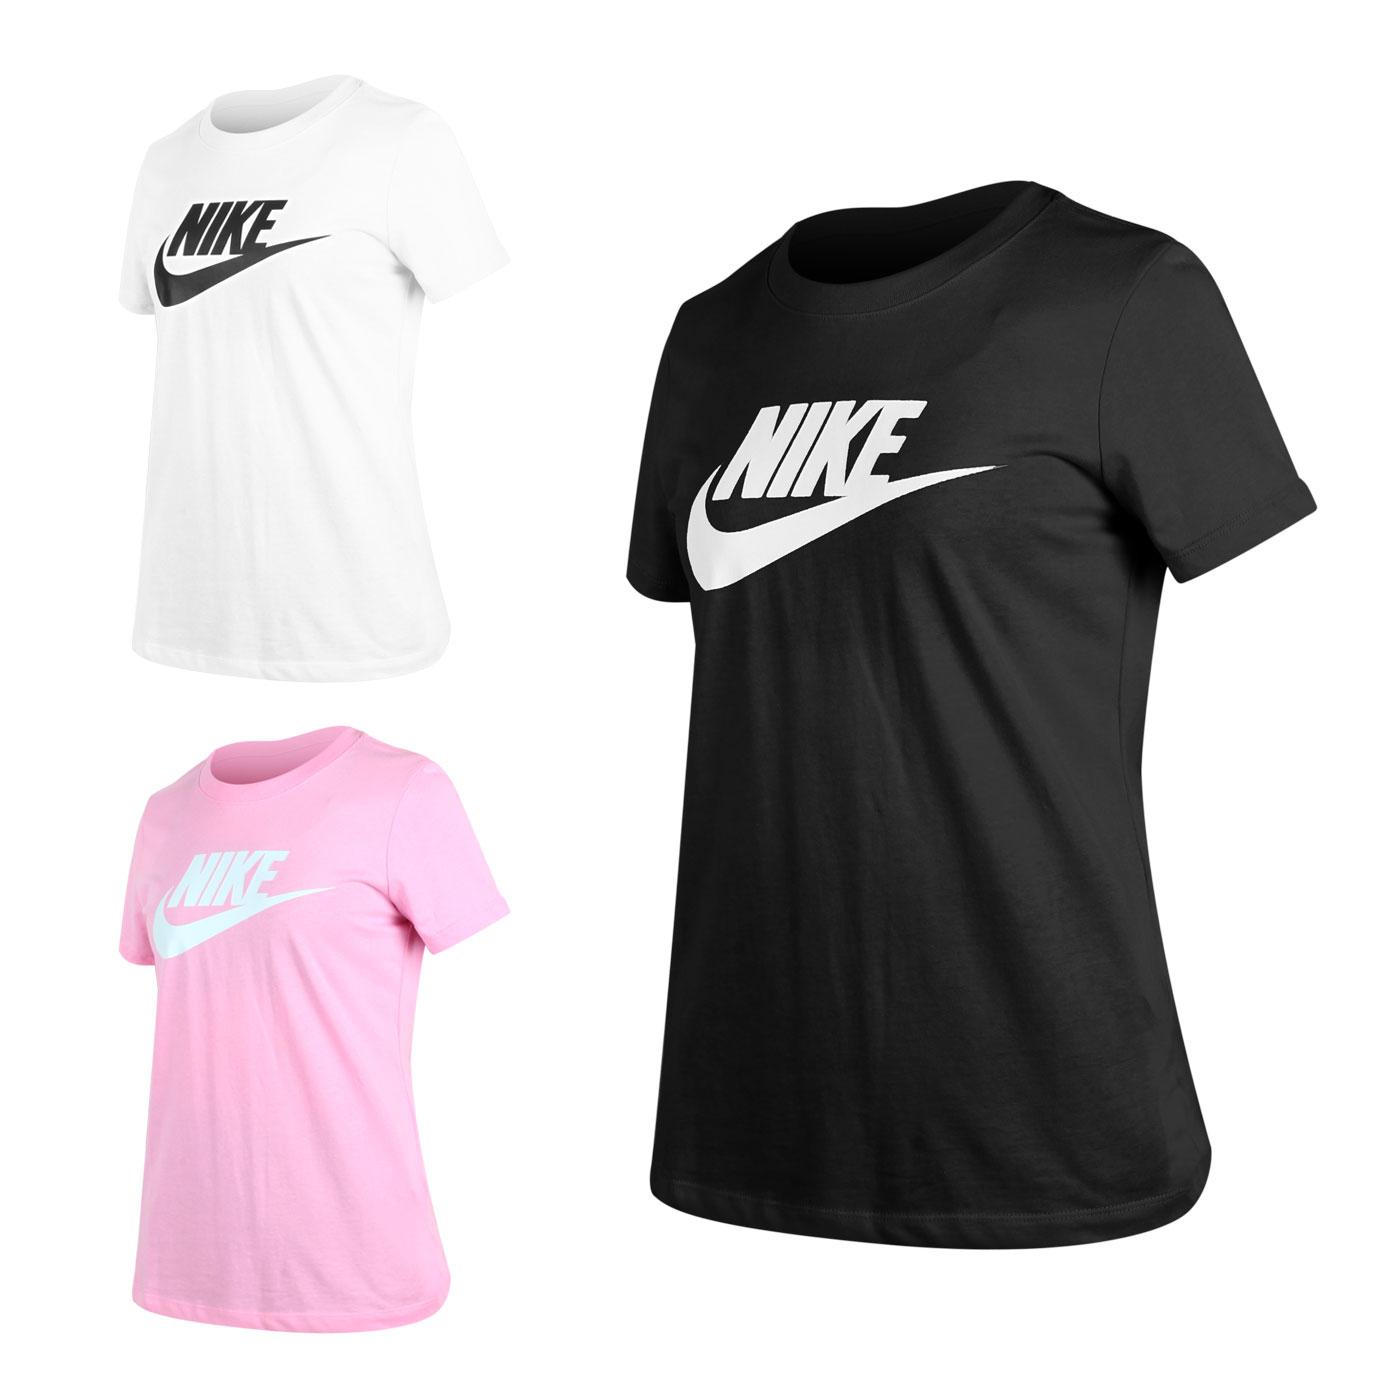 NIKE 女款短袖T恤 BV6170010